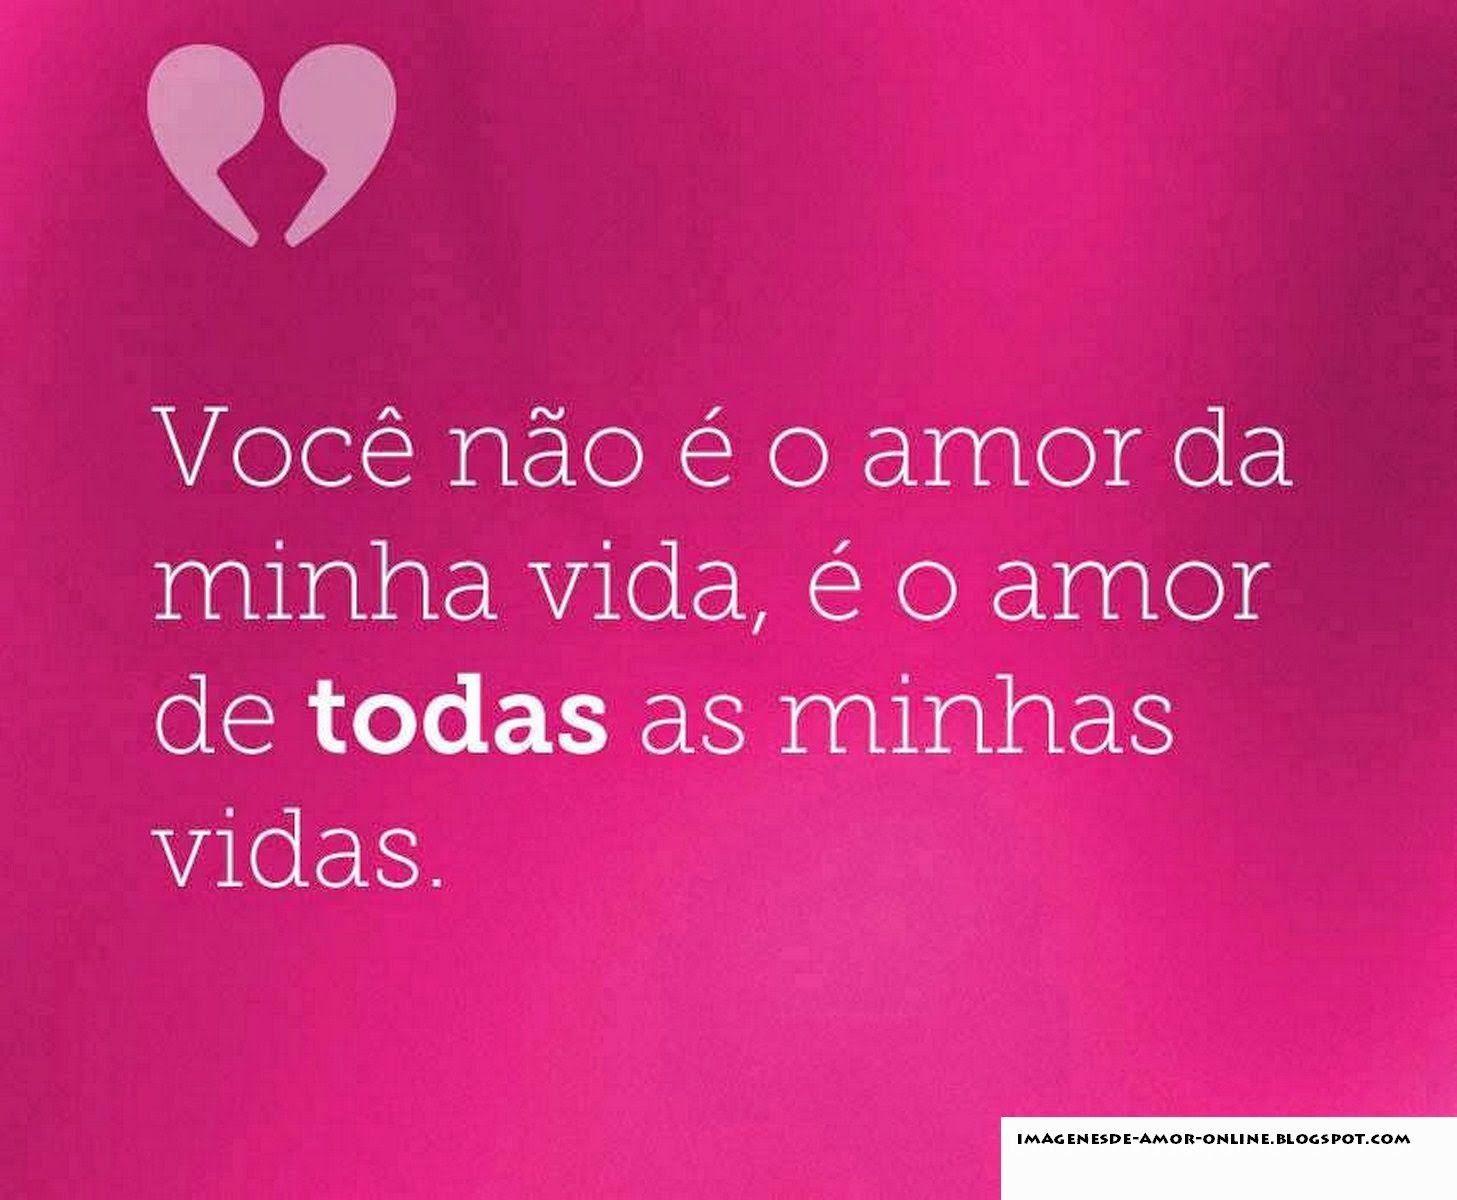 Las Palabras Mas Lindas En Portugues Buscar Con Google